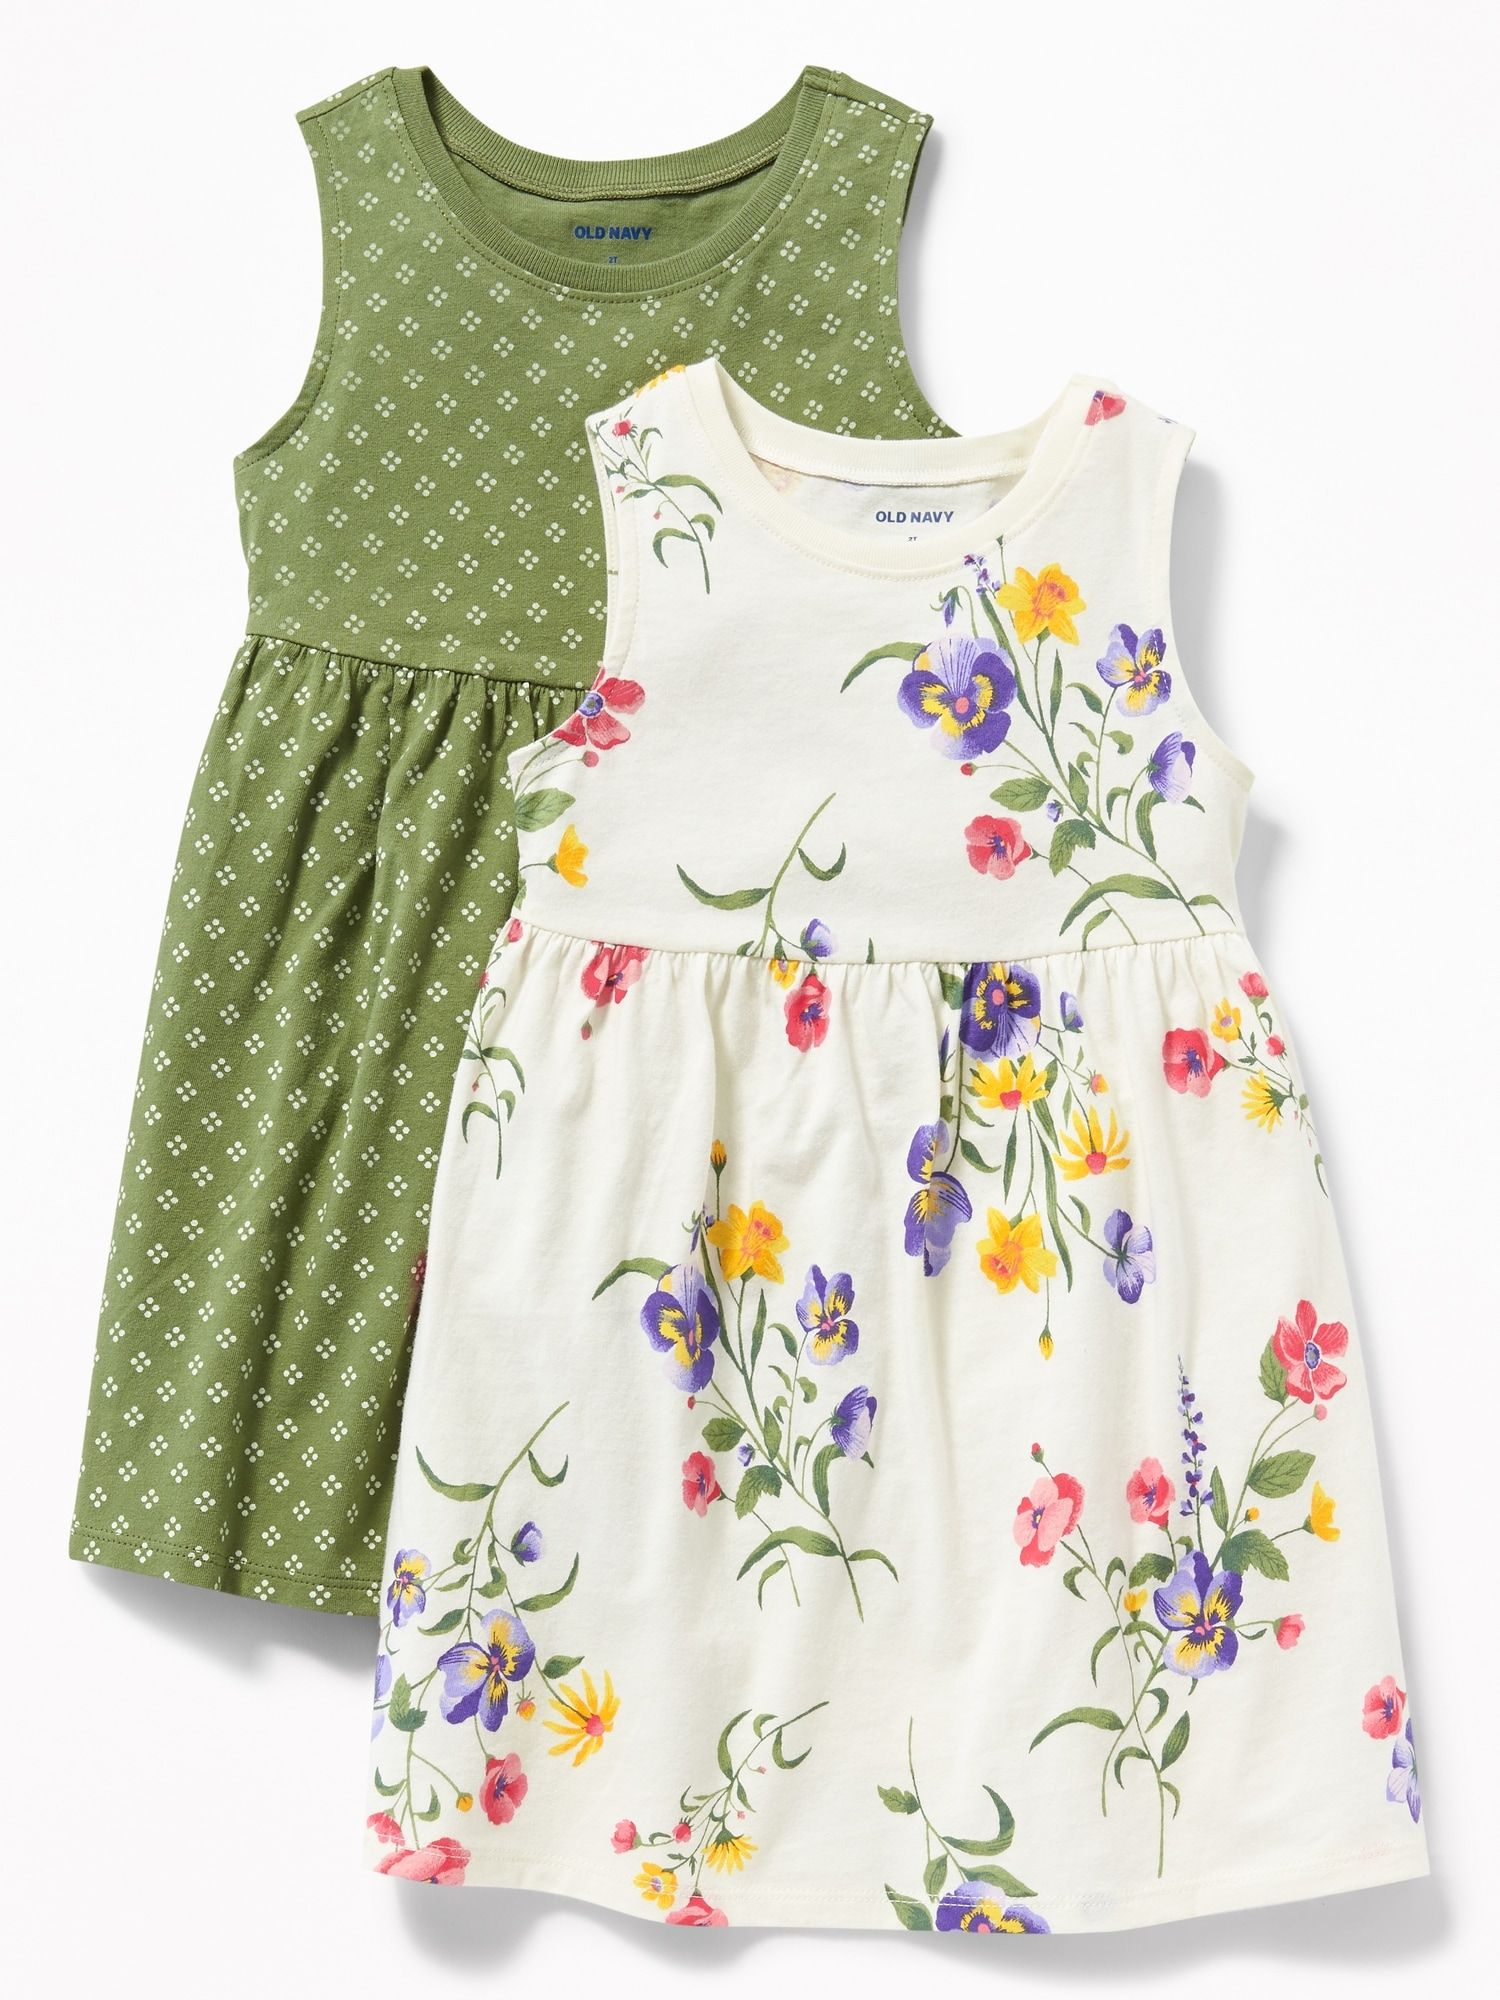 Floral Print Jersey Fit Flare Dress 2 Pack For Toddler Girls Old Navy Kids Dress Toddler Girl Dresses Plain Dress Casual [ 2000 x 1500 Pixel ]